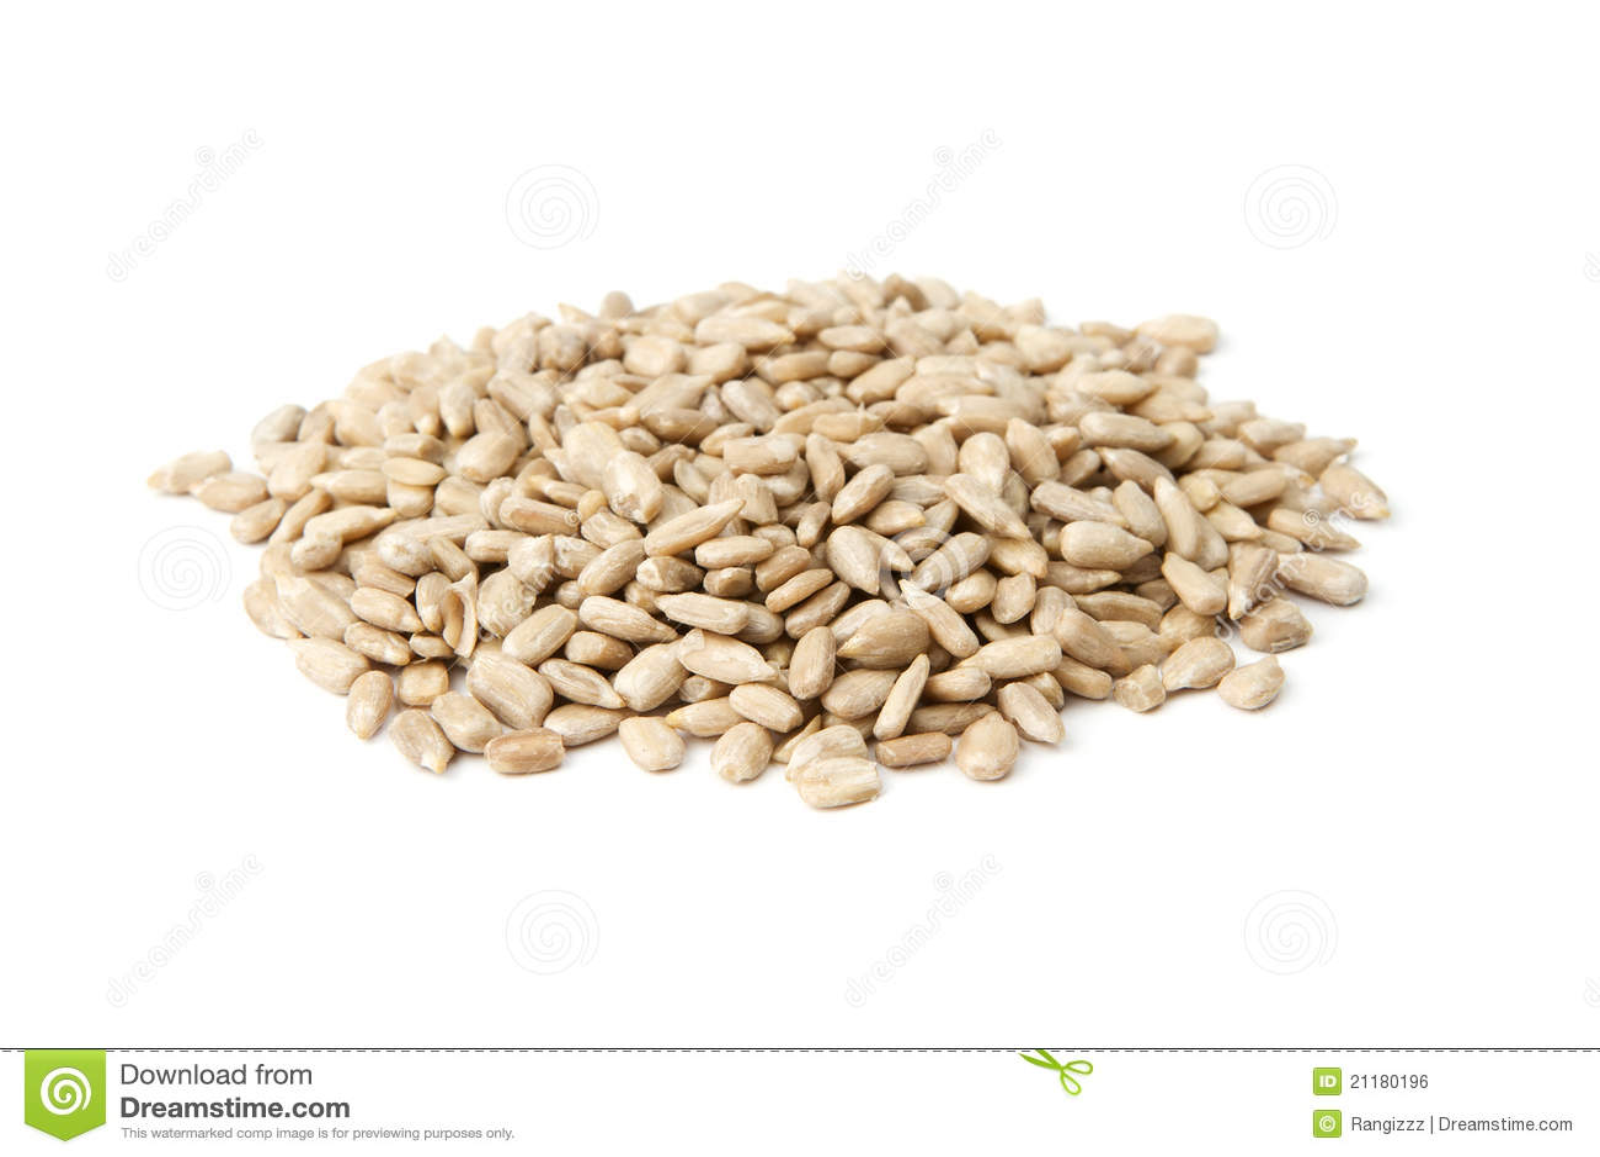 Sunflower seeds on white